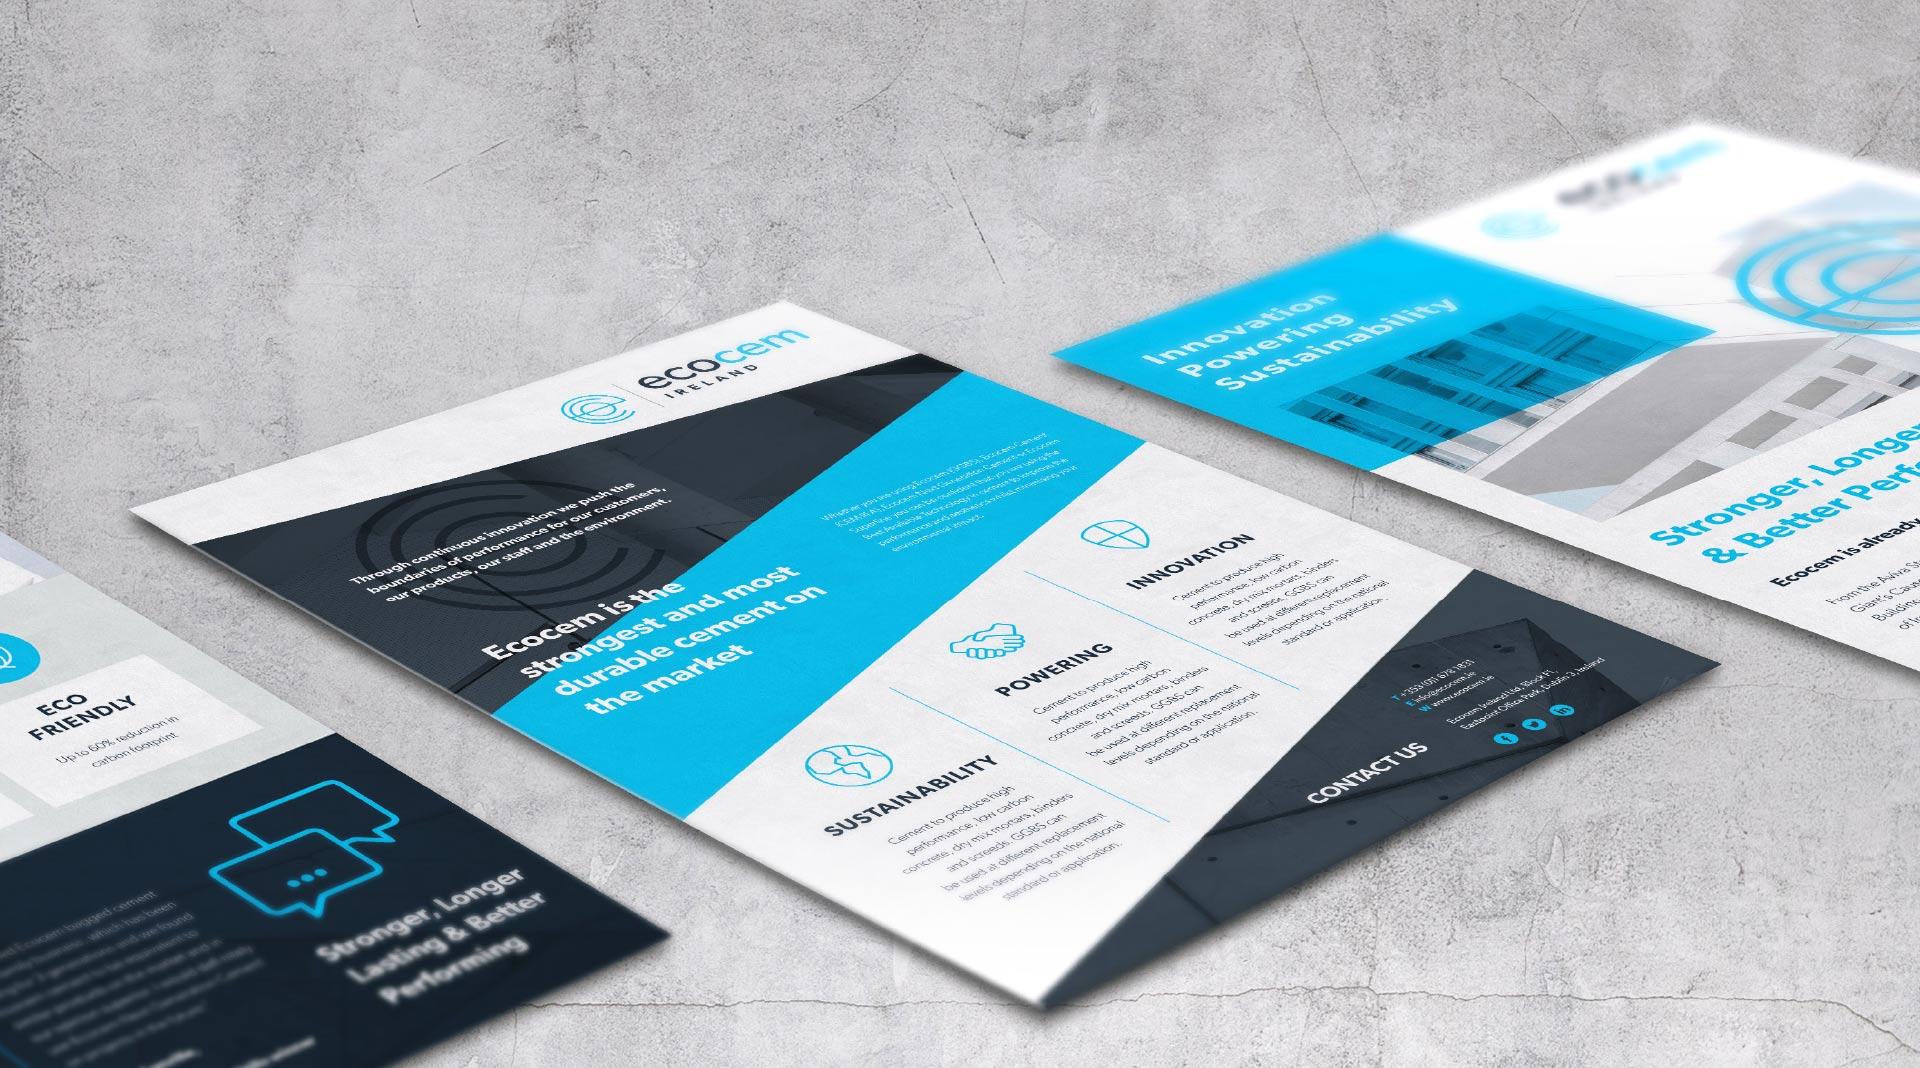 Ecocem Ireland design of technical data sheets